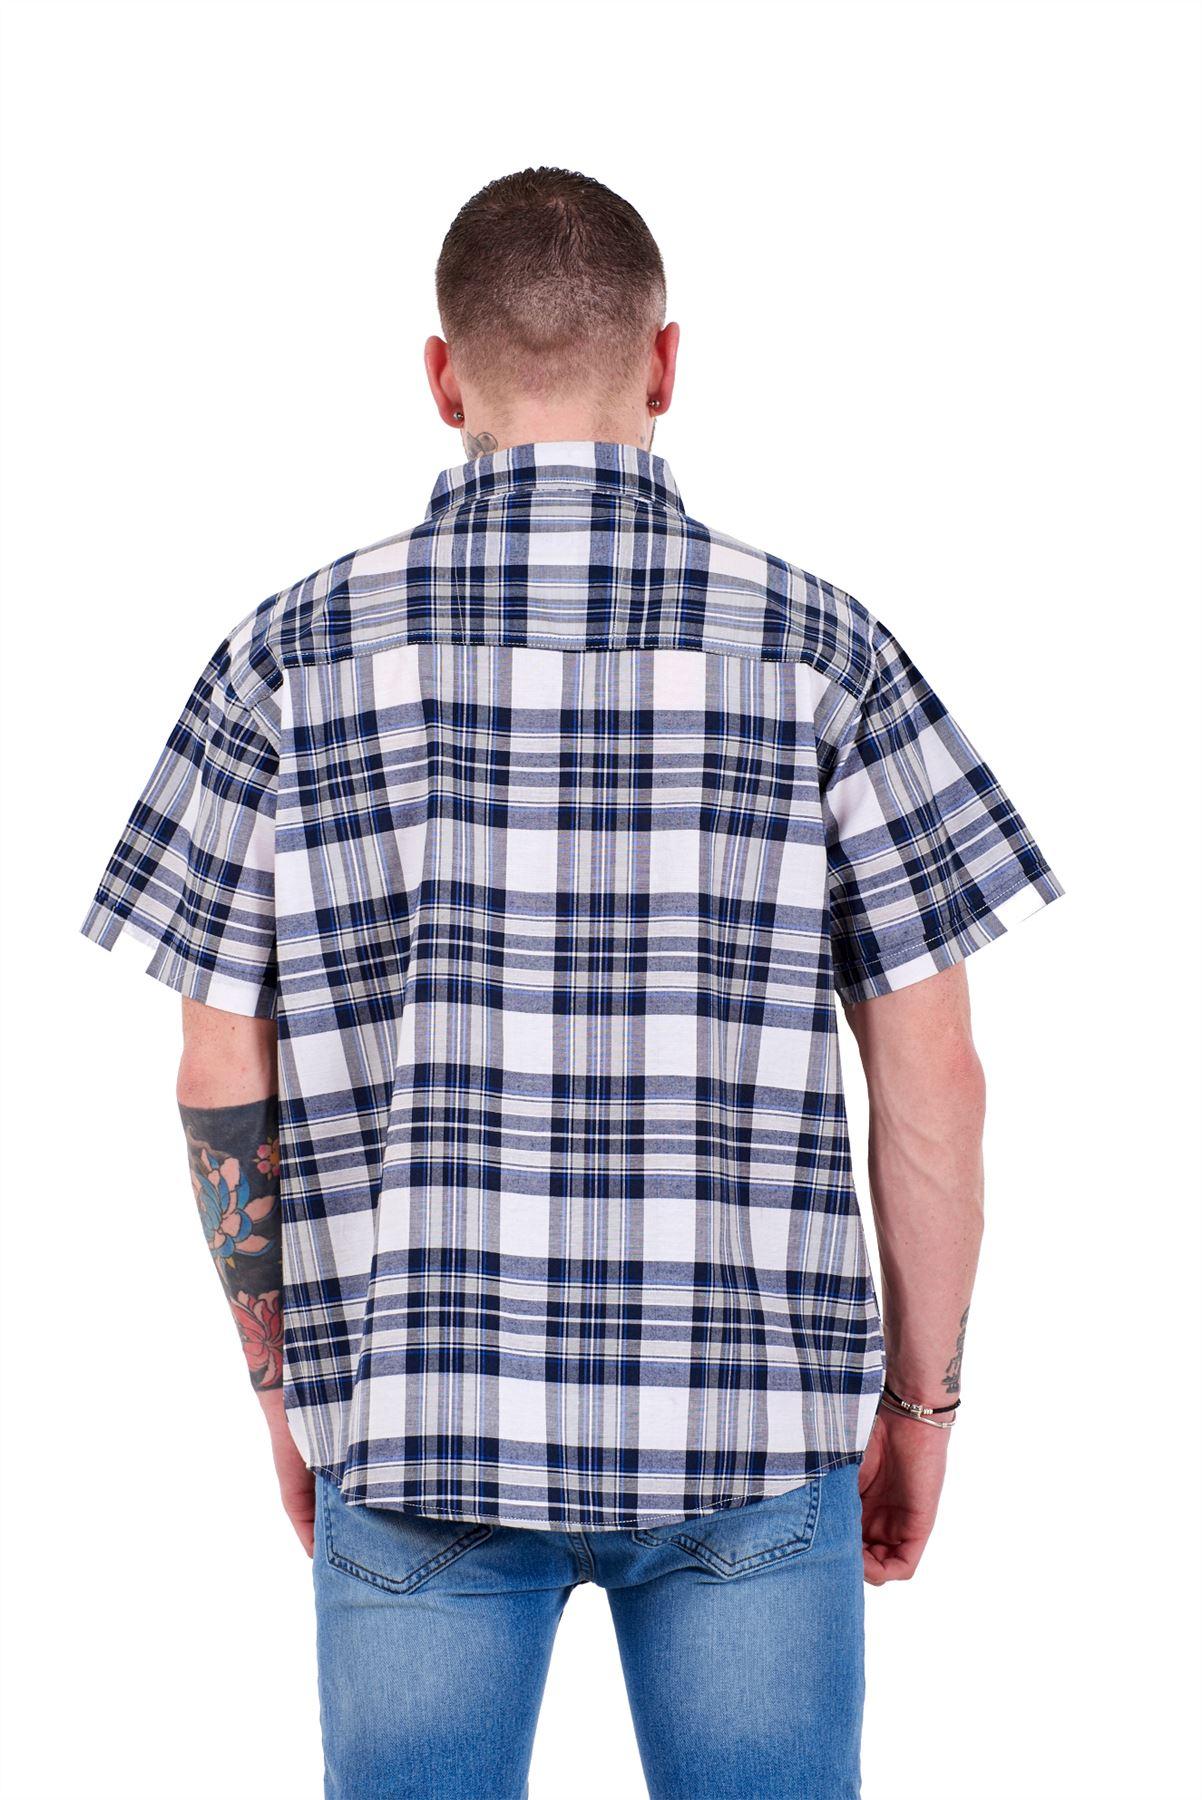 Mens-Regular-Big-Size-Shirts-Checked-Cotton-Blend-Casual-Short-Sleeve-M-to-5XL thumbnail 11